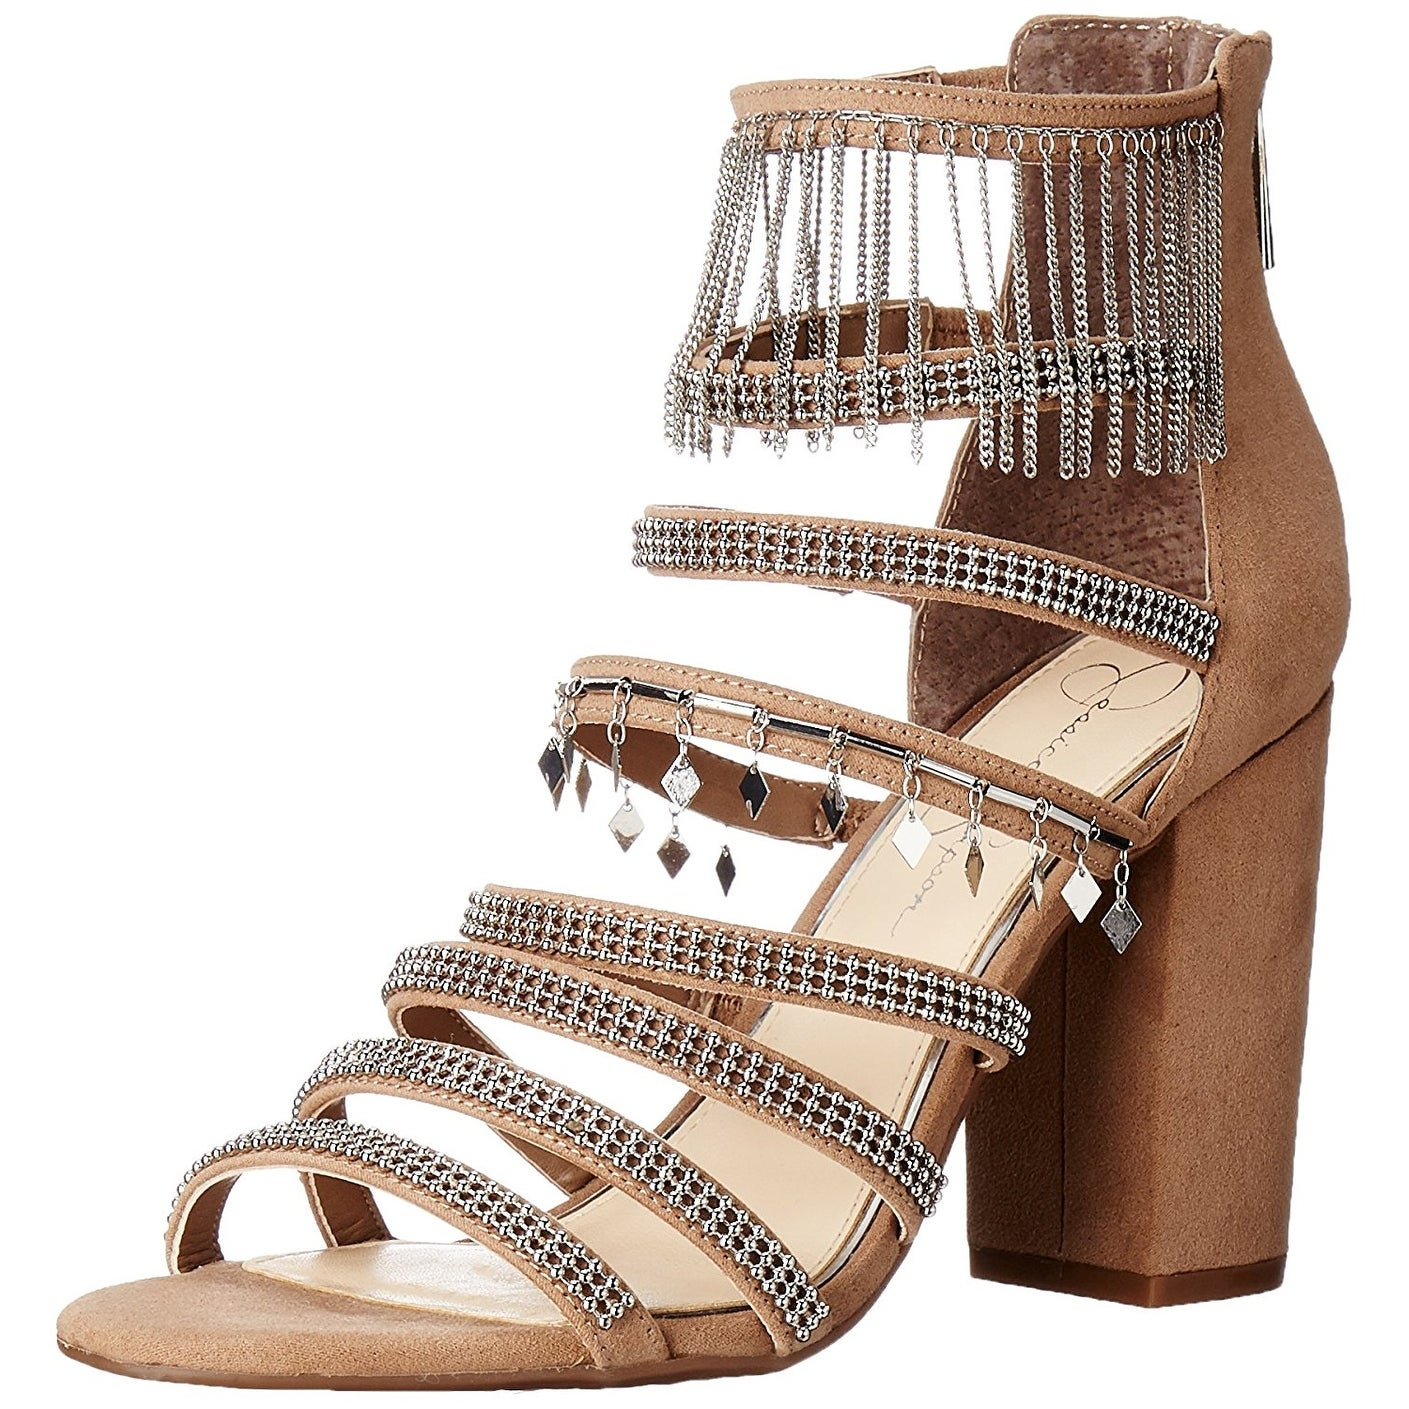 Jessica Simpson Katalena Women/'s Strappy Sandals Brown